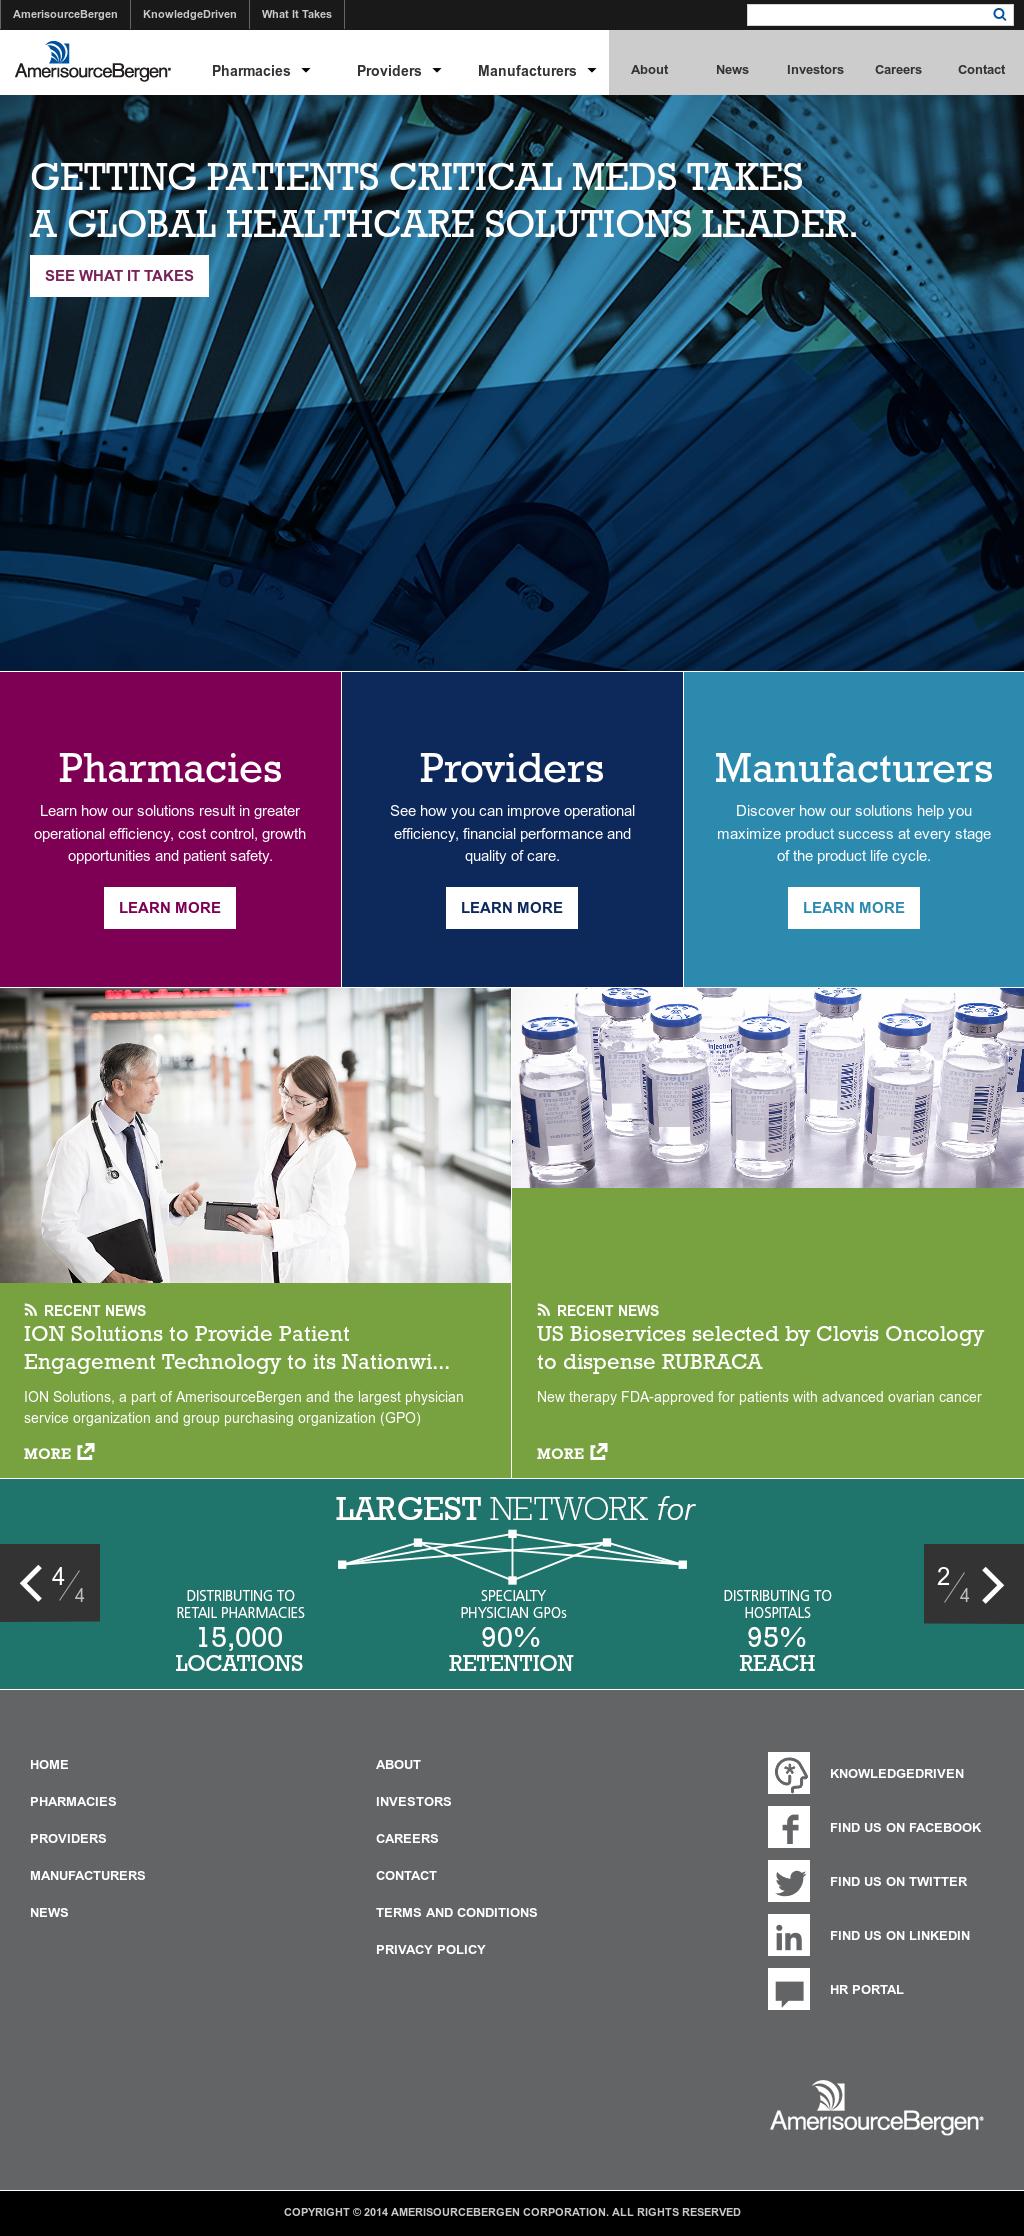 AmerisourceBergen Competitors, Revenue and Employees - Owler Company